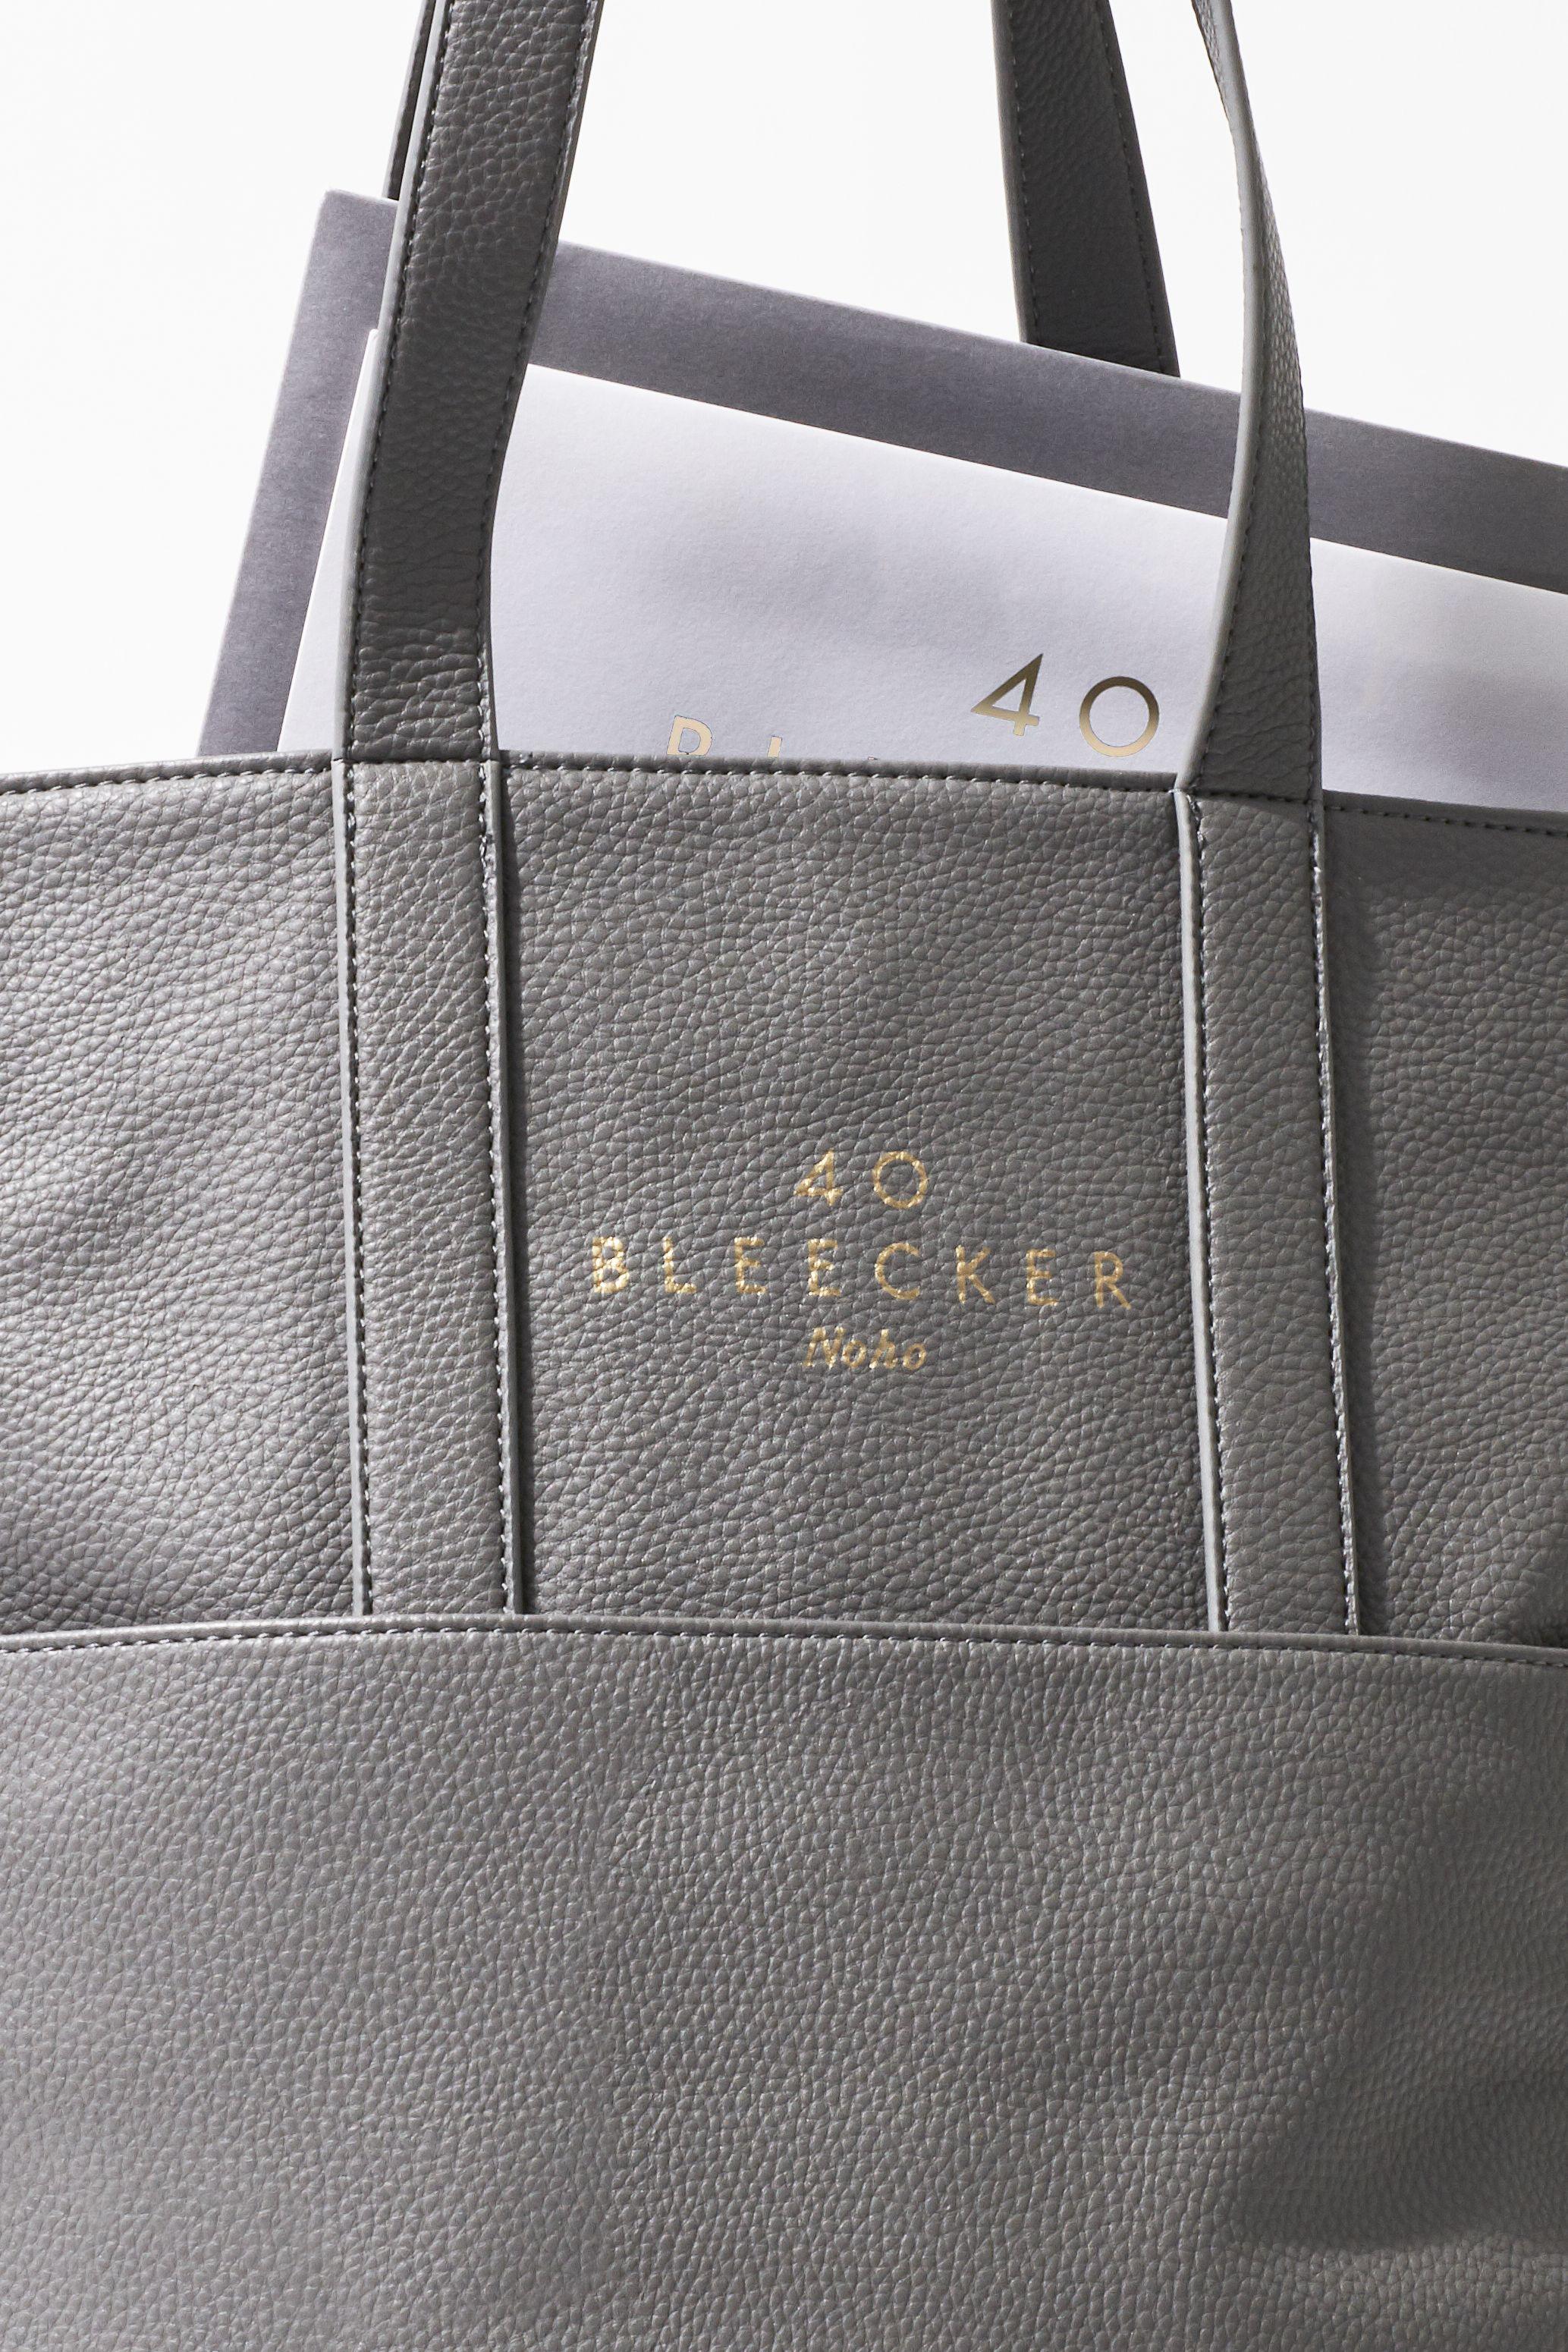 40 Bleecker marketing tote bag design